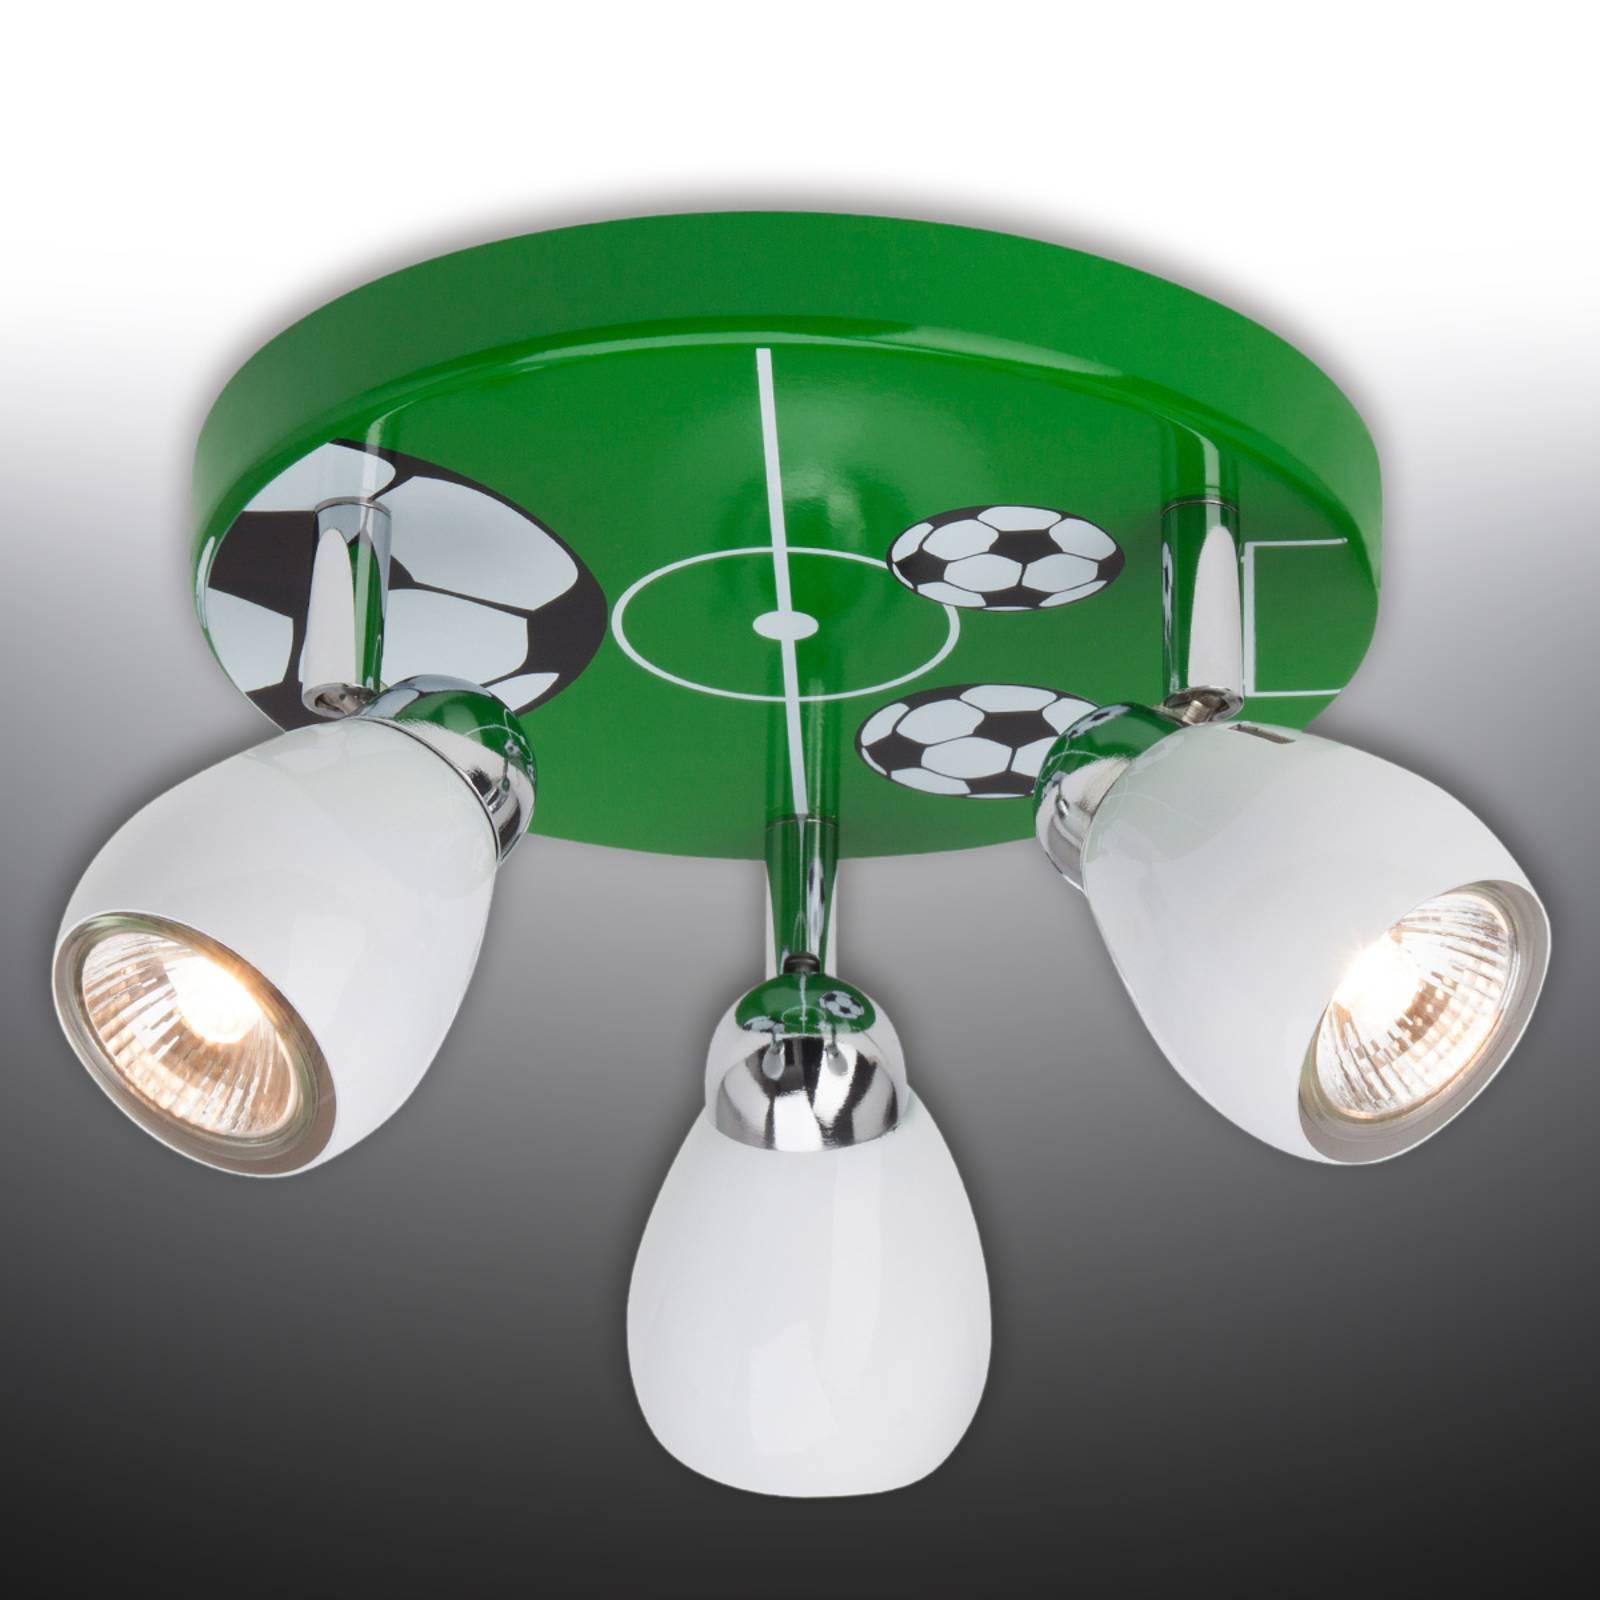 Soccer-LED-kattovalaisin, kolmilamppuinen